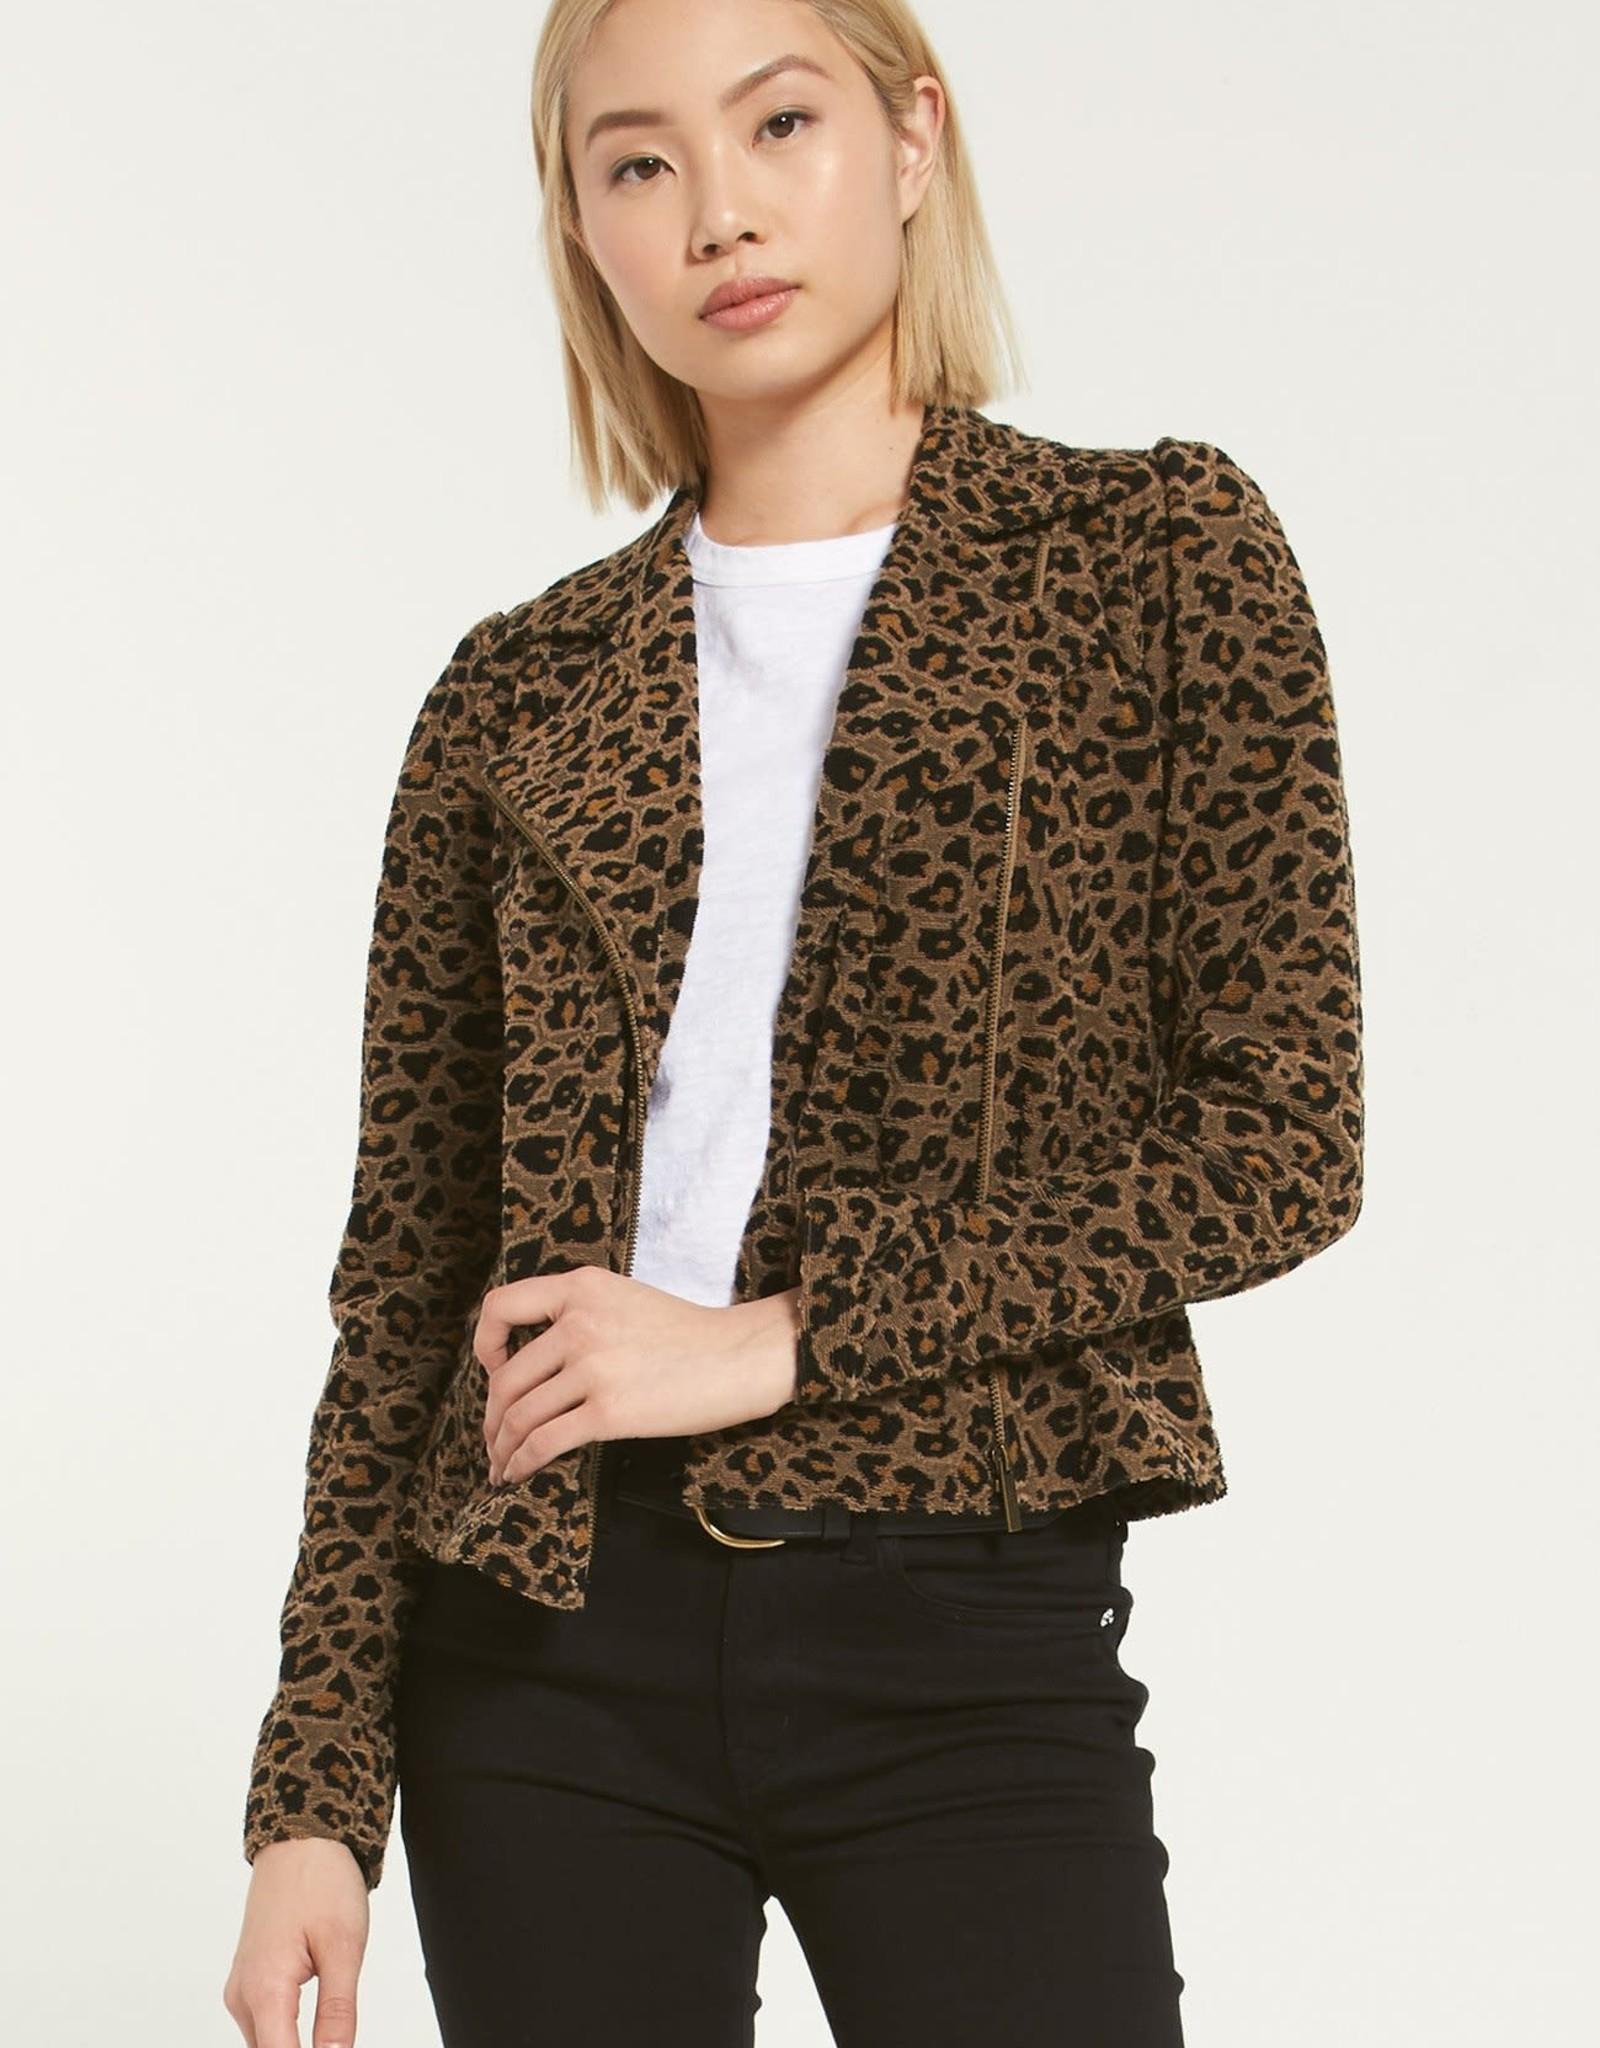 Z Supply Charley Jacquard Jacket